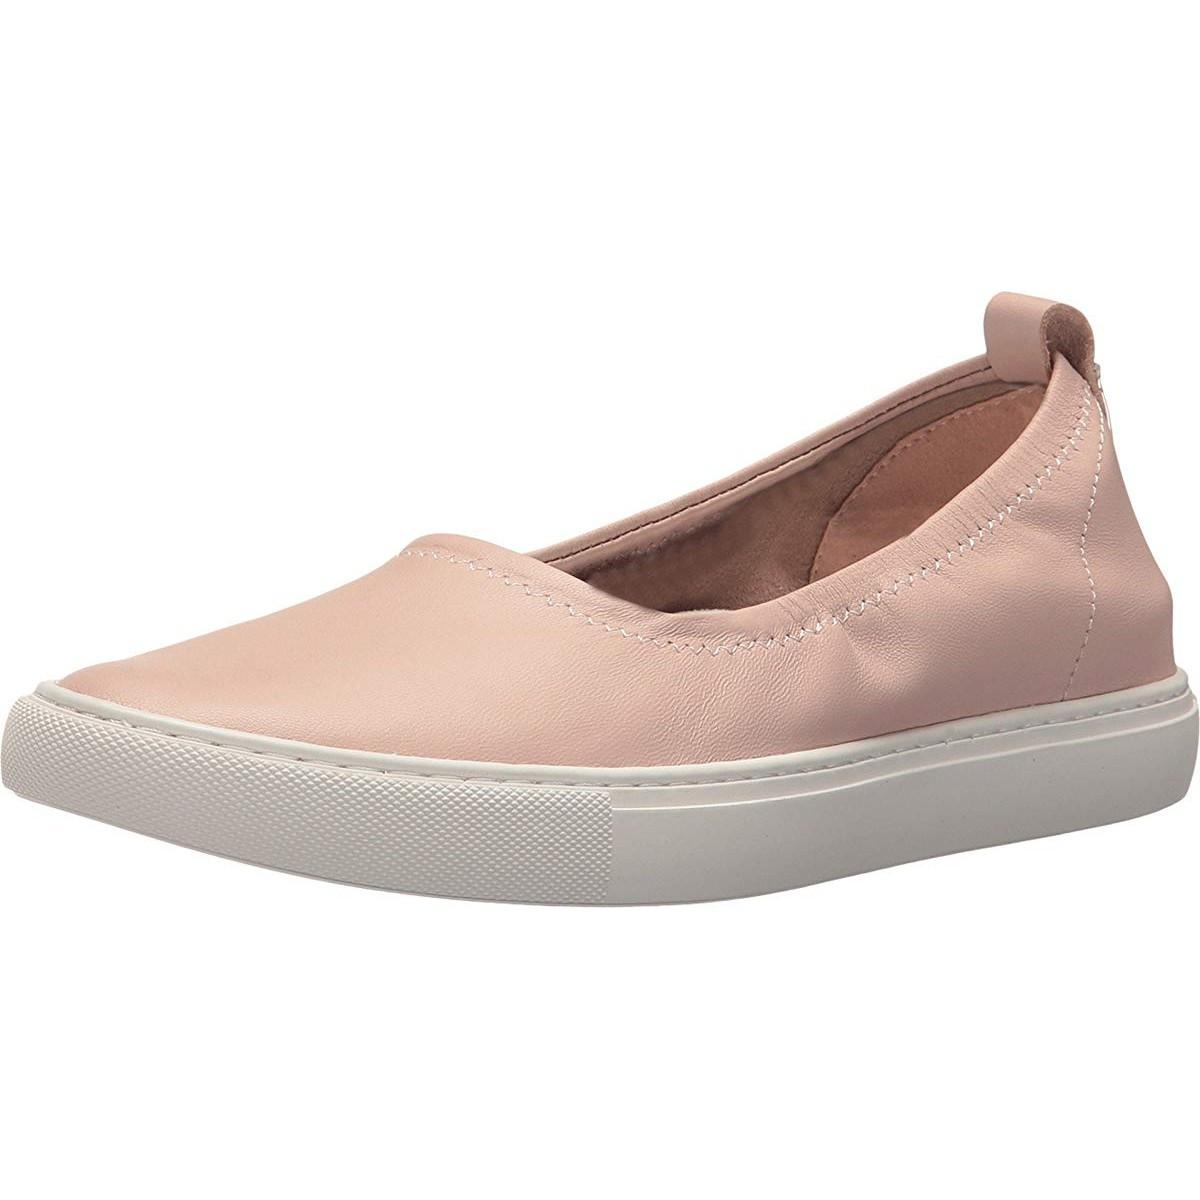 Кроссовки Kenneth Cole New York Kam Ballet Pink - Оригинал, фото 1